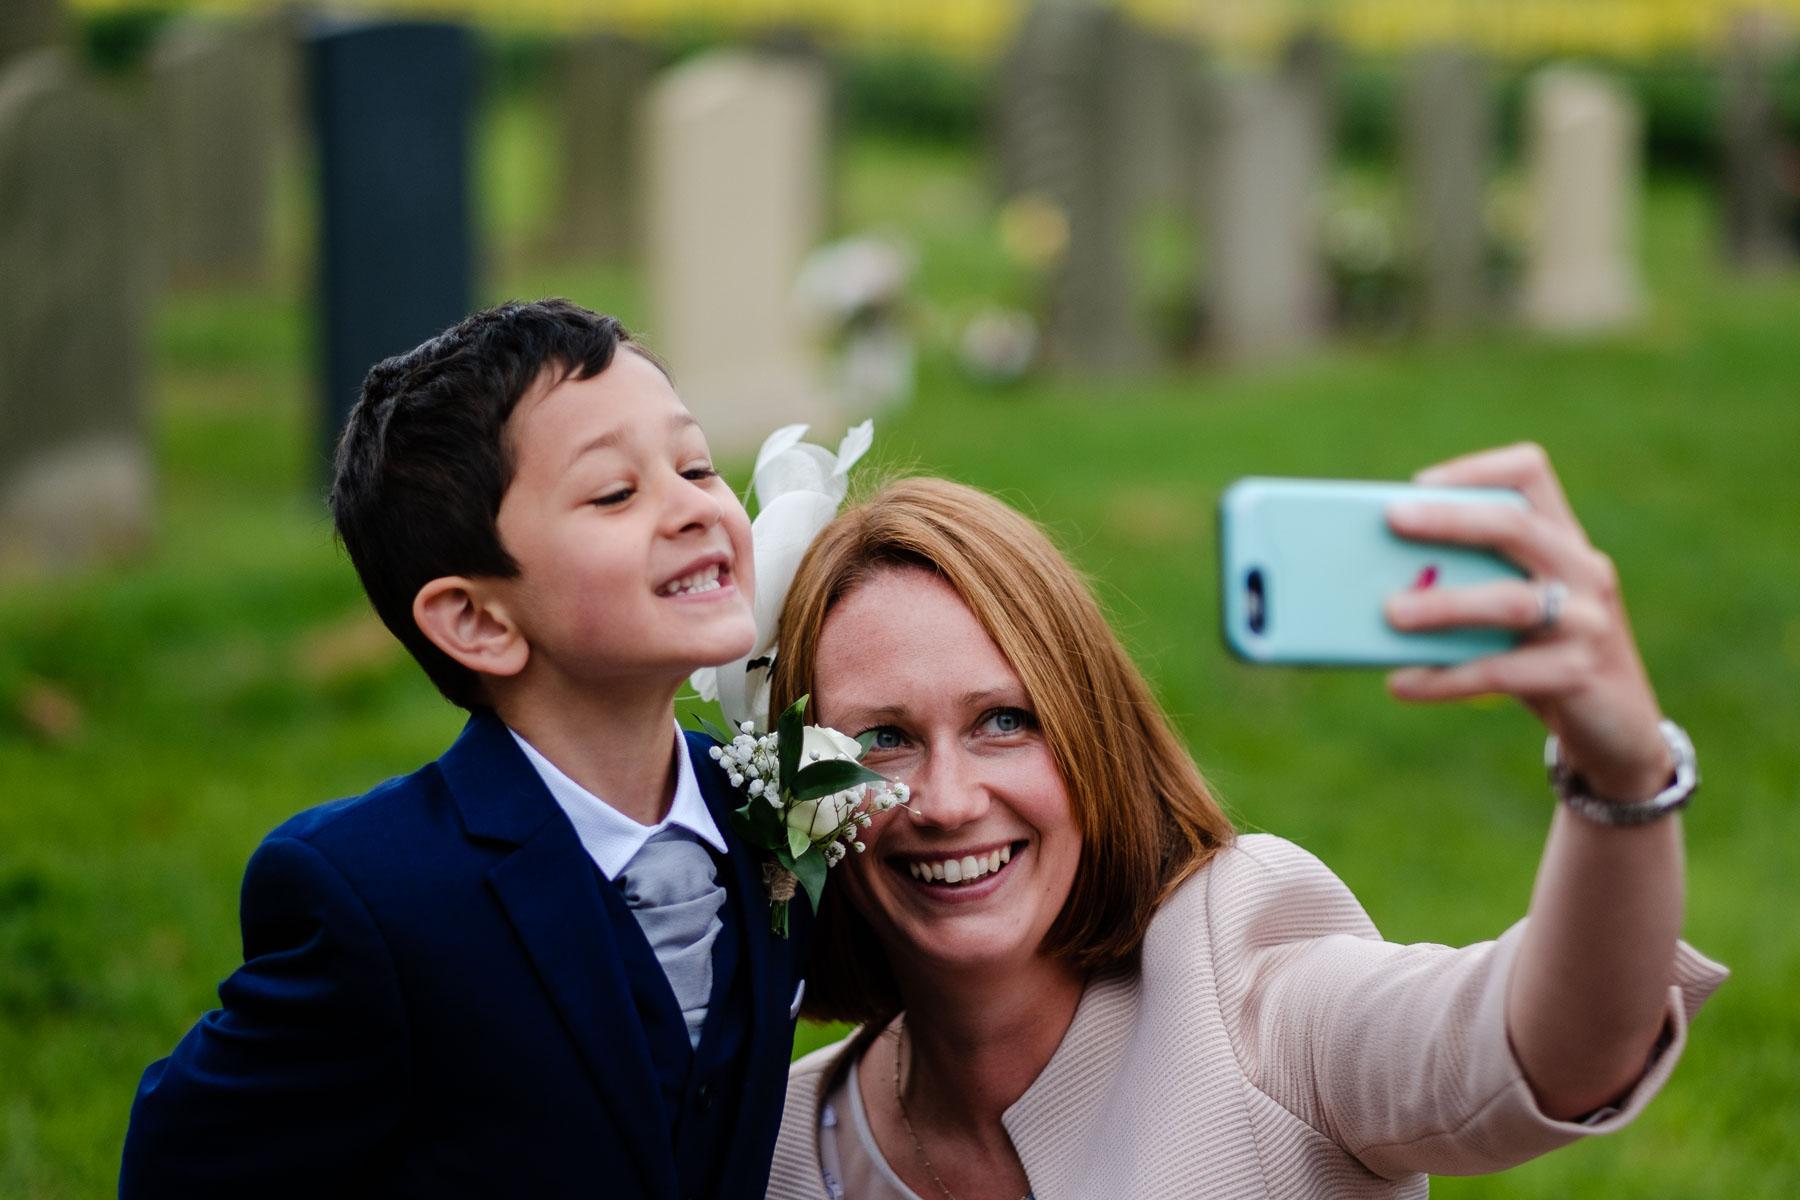 Crathorne Hall Wedding Photography - Jo & Paul (140).jpg